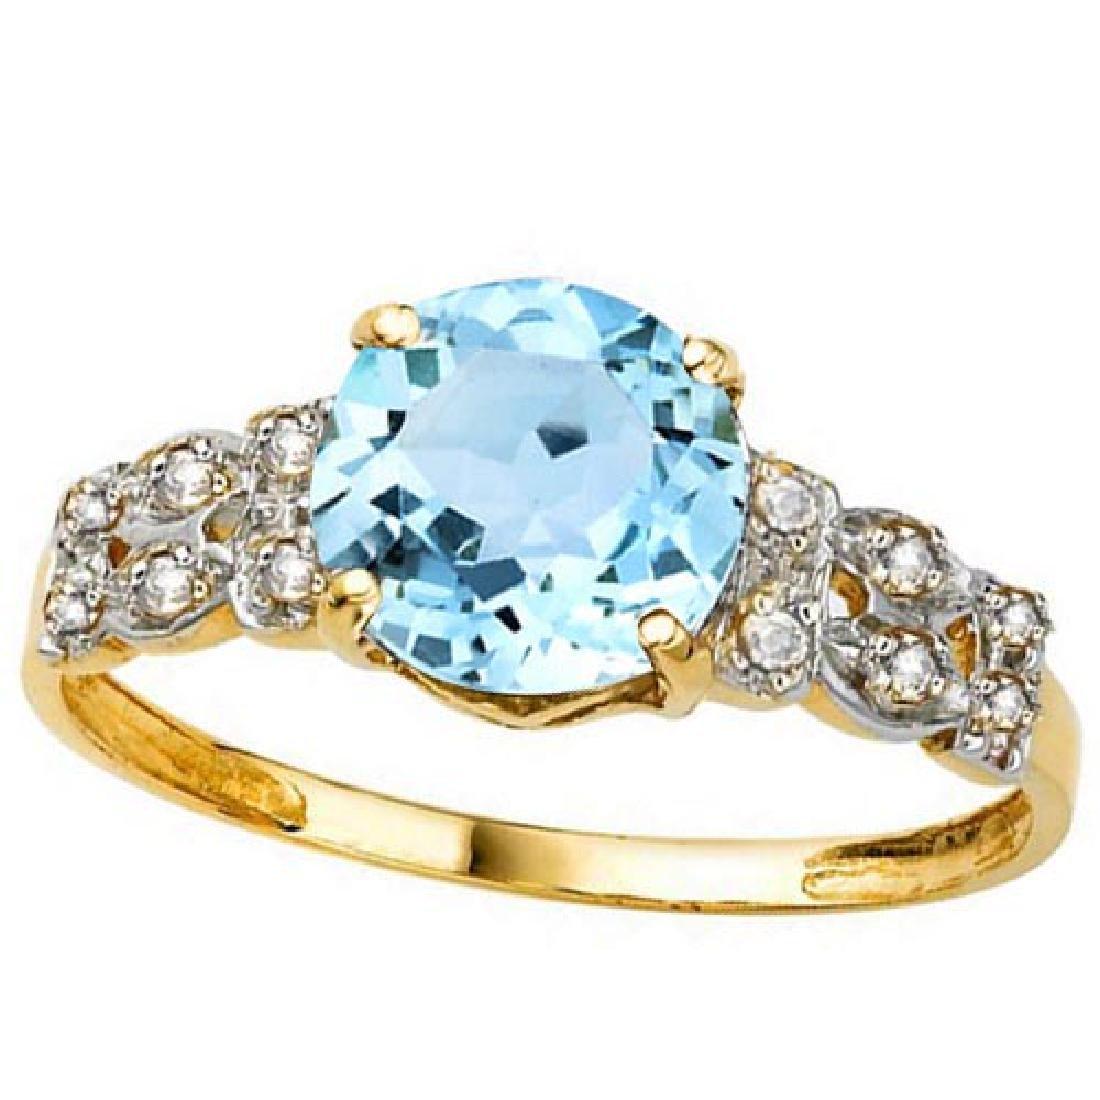 2.37 CTW GENUINE SKY BLUE TOPAZ & GENUINE DIAMOND (12 P